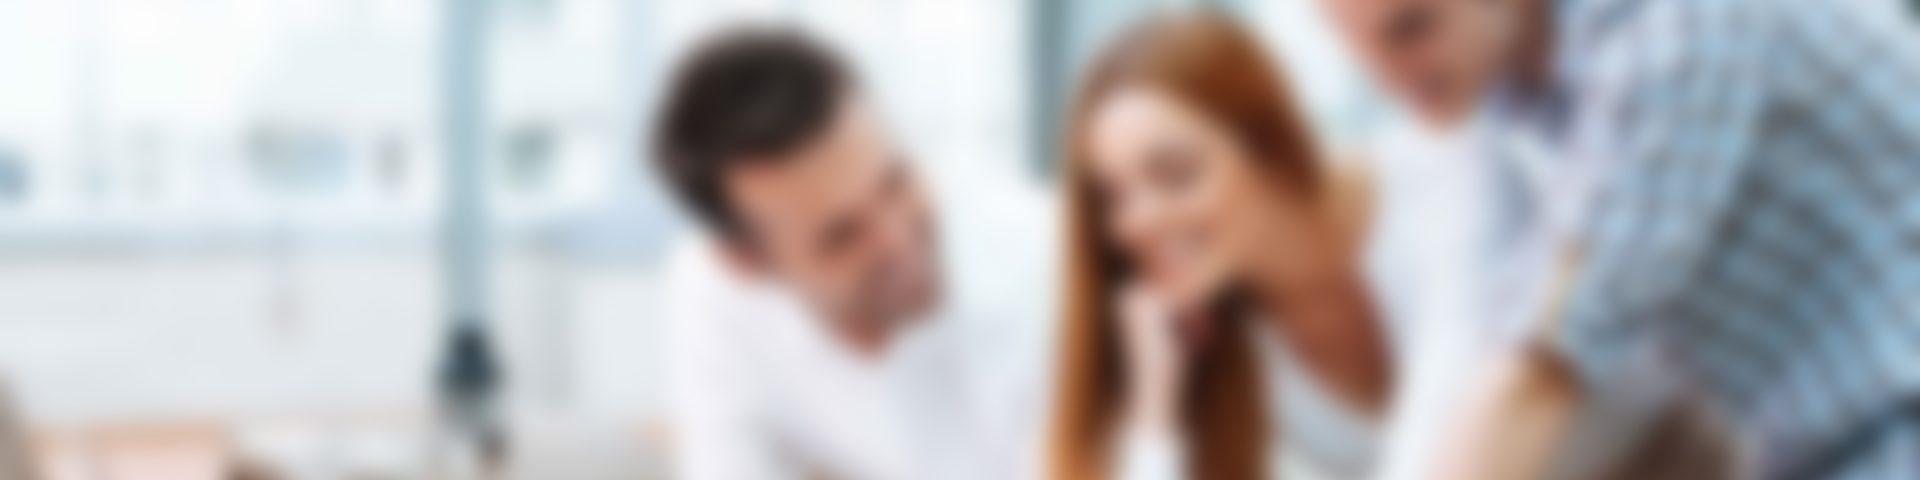 ConsultingPress Multi Niche Consulting WordPress Theme Company News List Layout